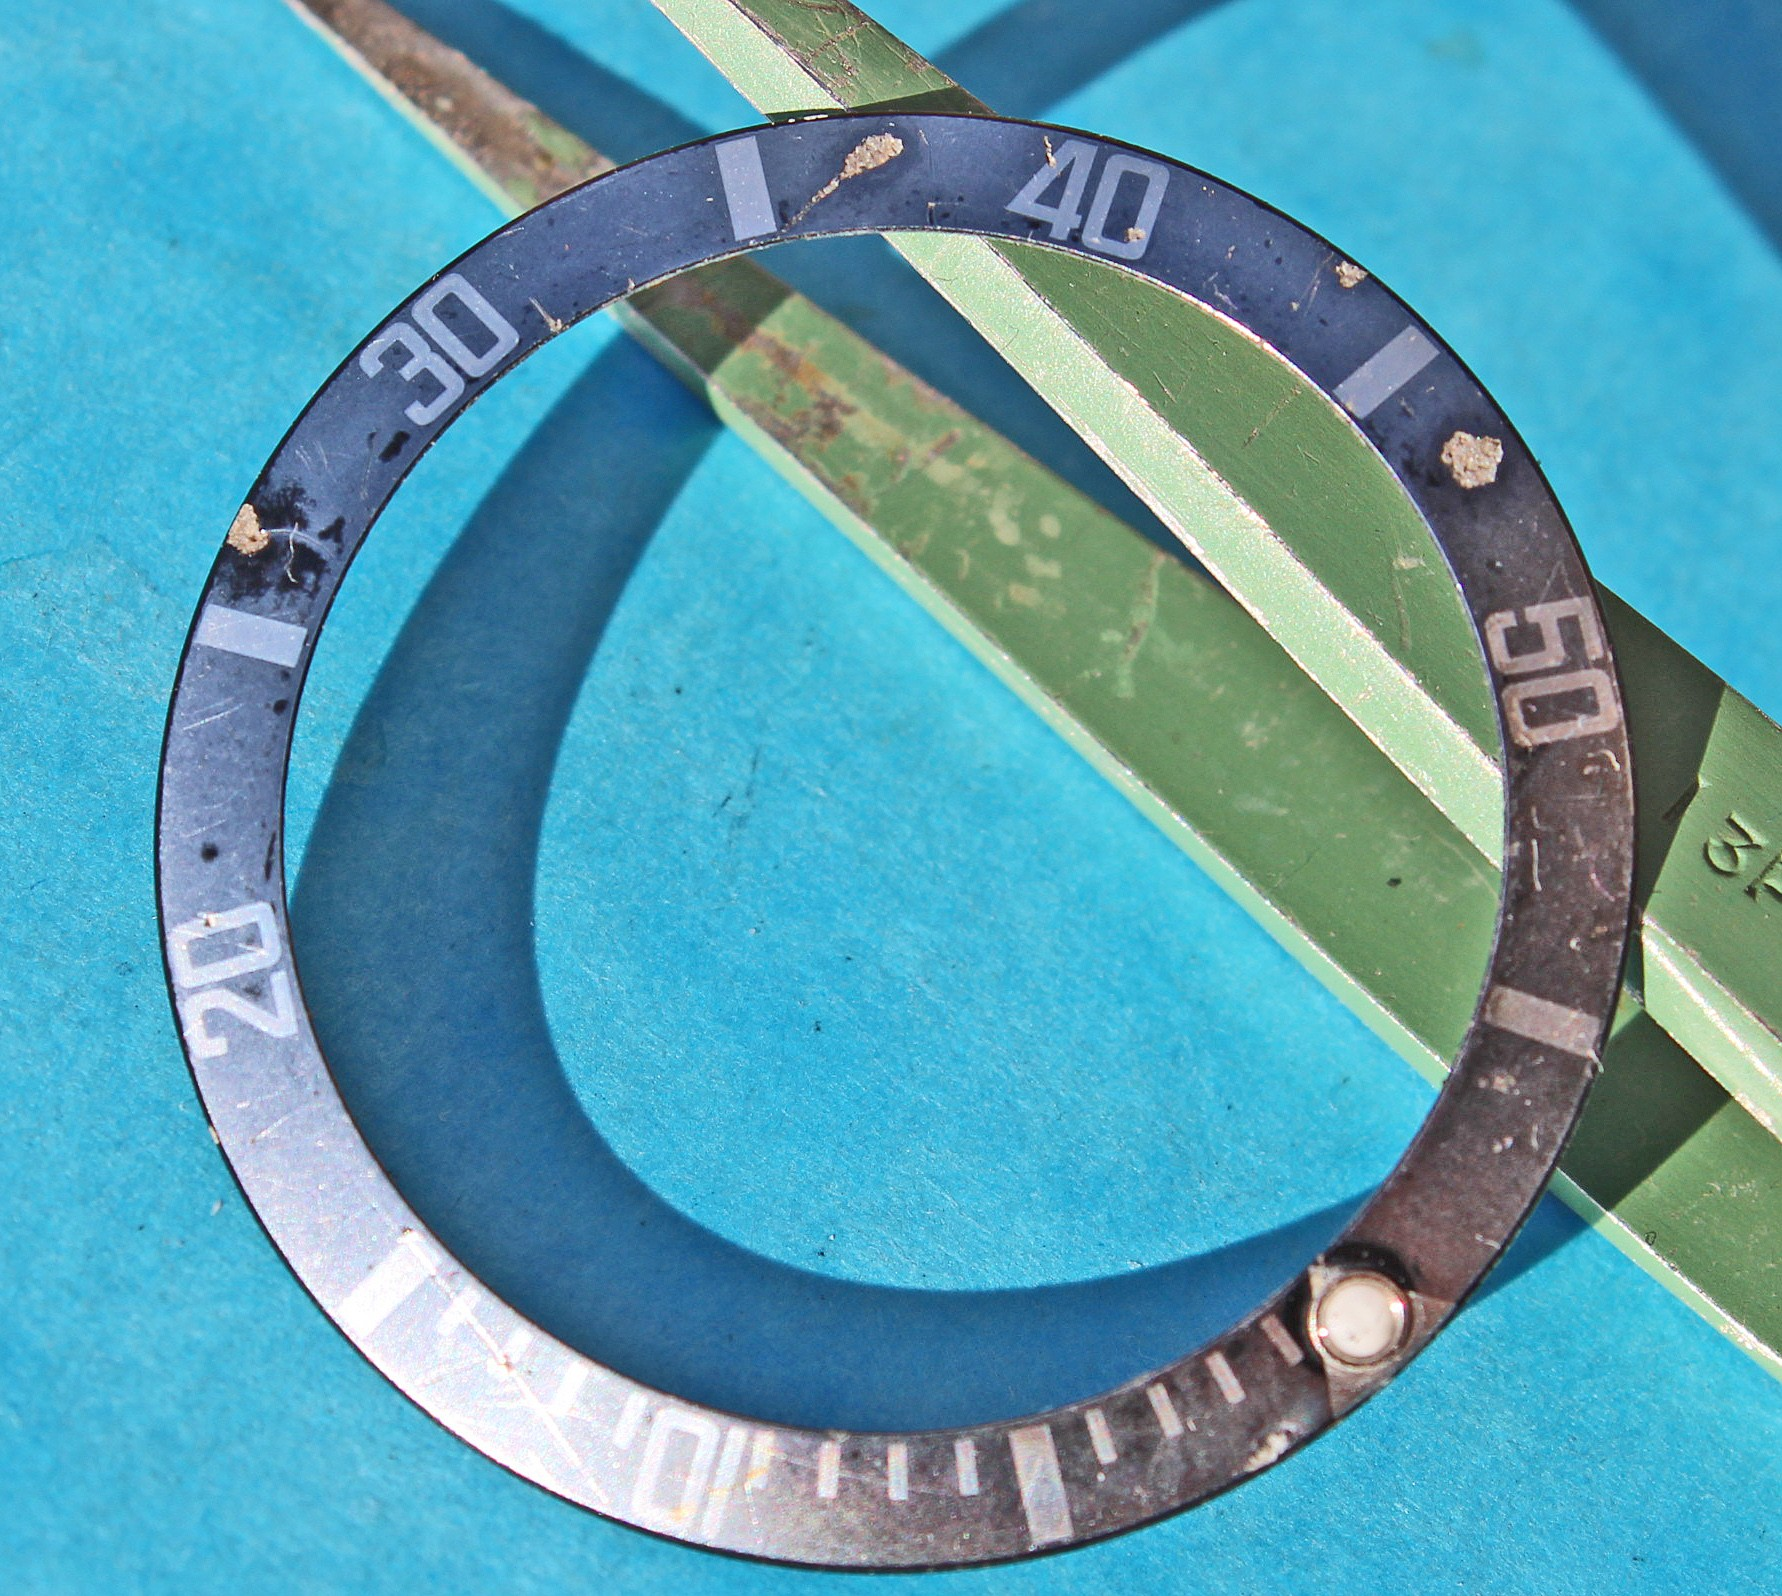 Freaky Faded Rolex Submariner Bezel Insert Black Stainless Steel 16800/0 16610 aged